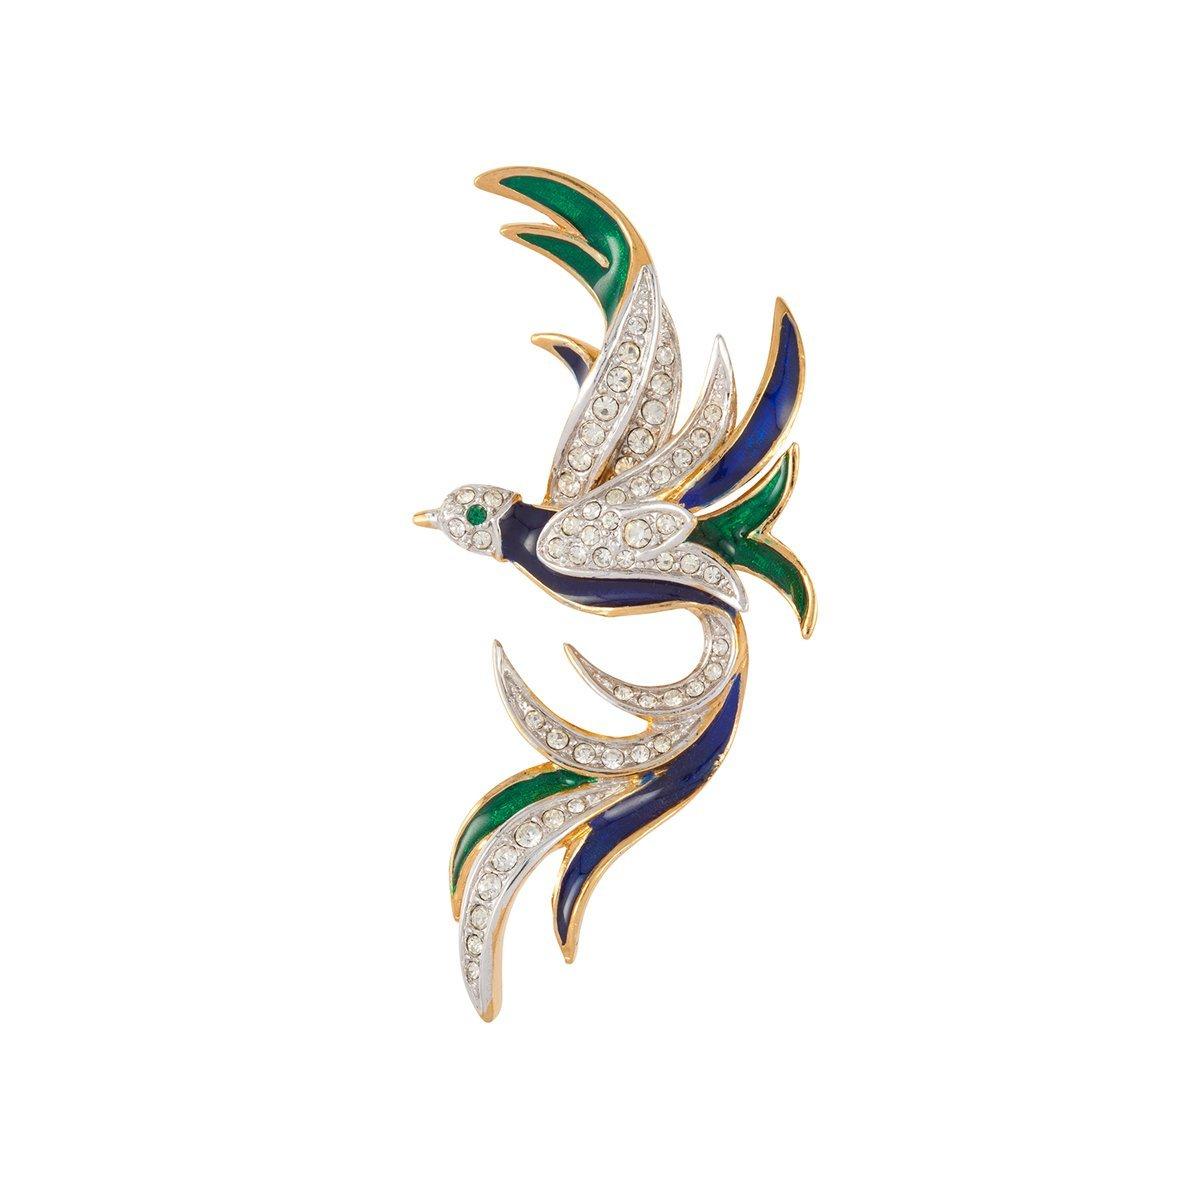 SUSAN CAPLAN VINTAGE 1970S ATTWOOD & SAWYER SWAROVSKI CRYSTAL BIRD BROOCH